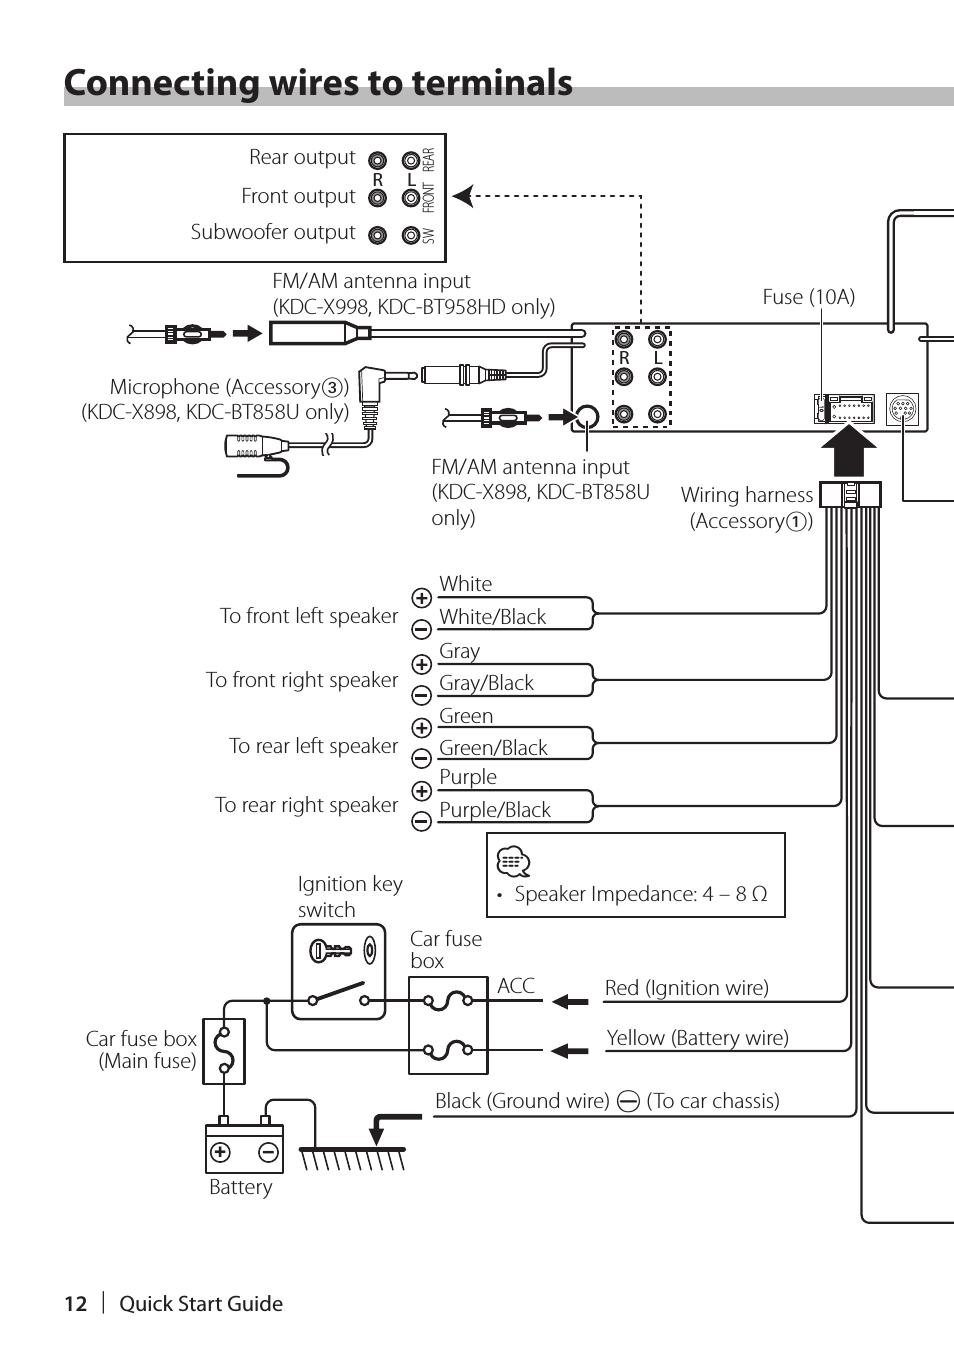 [DIAGRAM_3ER]  Kenwood Car Stereo Wiring Diagrams Kdc 416s - E5 wiring diagram | Kenwood Kdc X395 Wiring Diagram |  | KUBB-AUF.DE